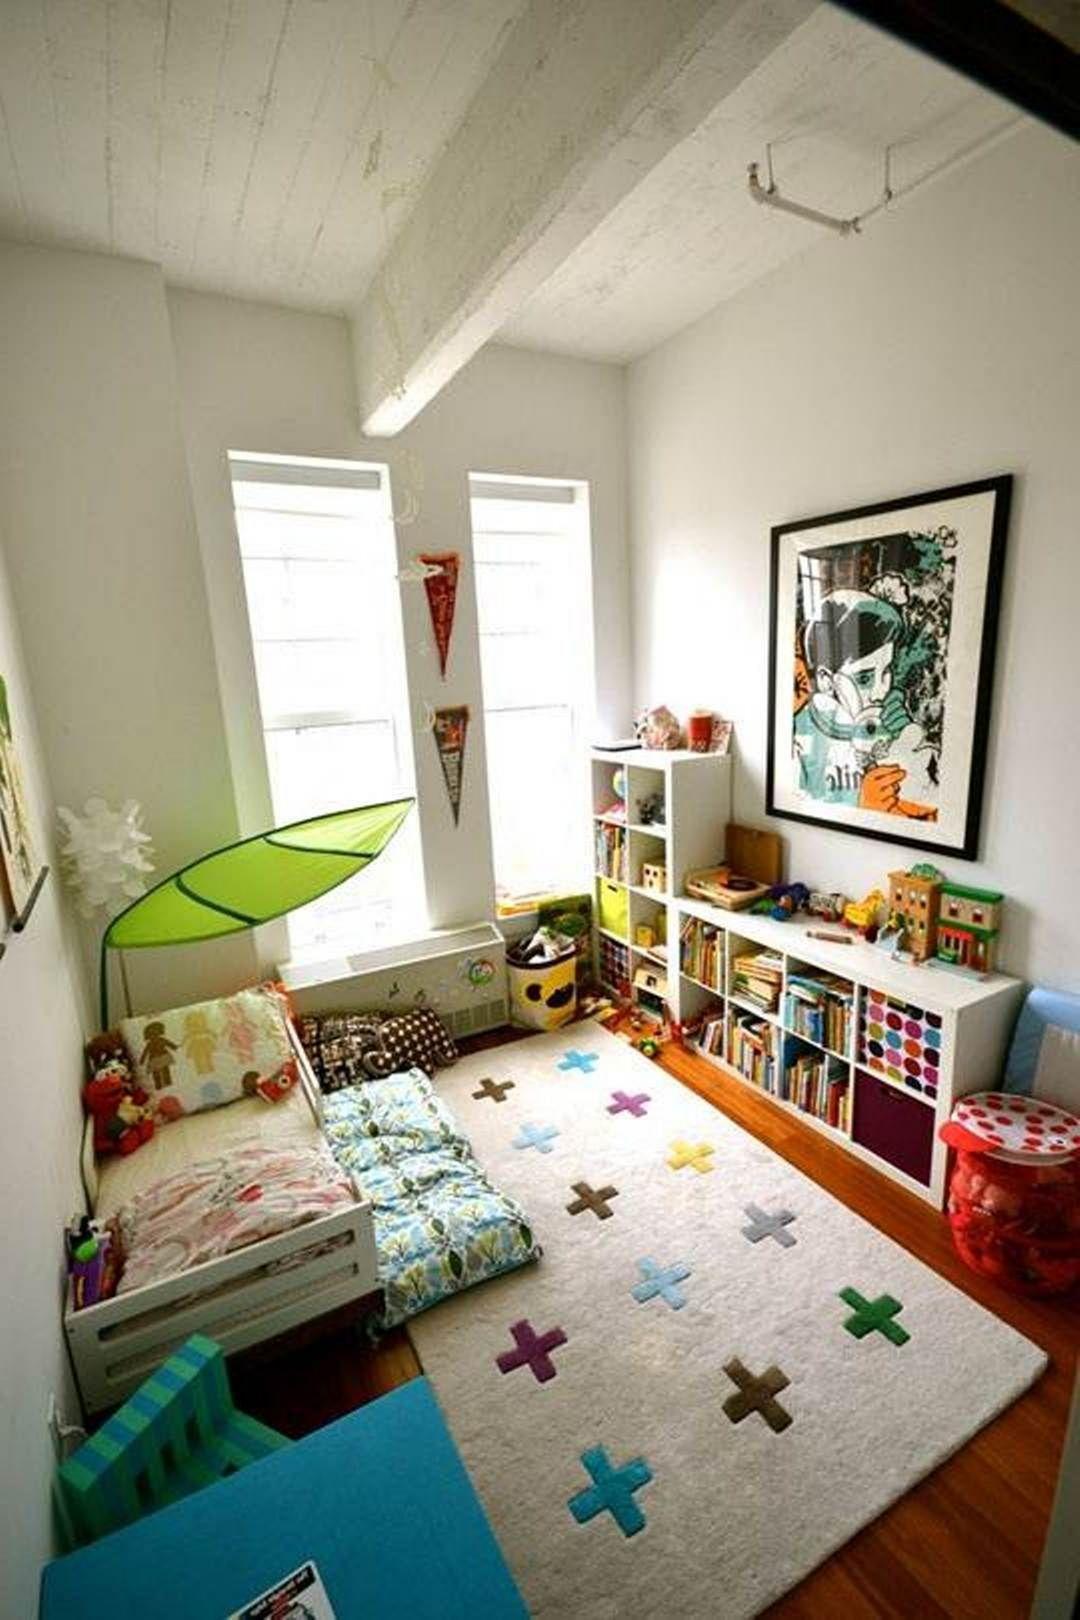 Fantastic Montessori Bedroom Design that Just Perfect for ...